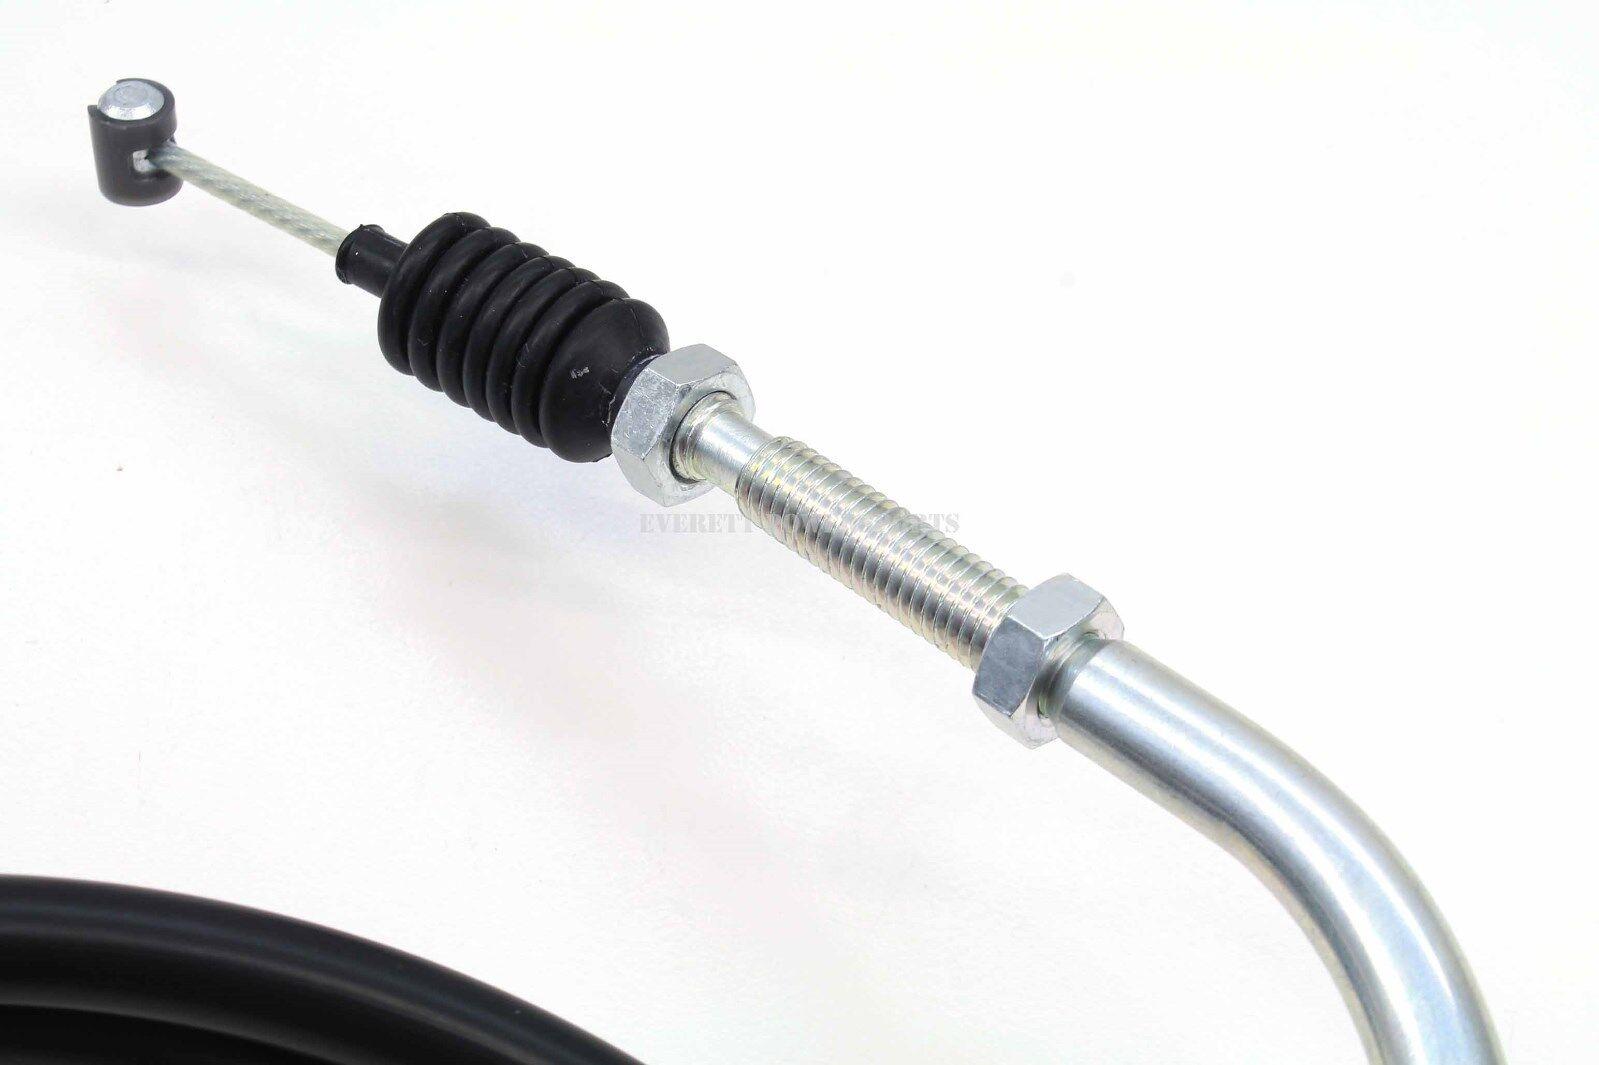 New Genuine Suzuki Clutch Cable 06-08 M109R Boulevard VZR1800 Z OEM Control P118